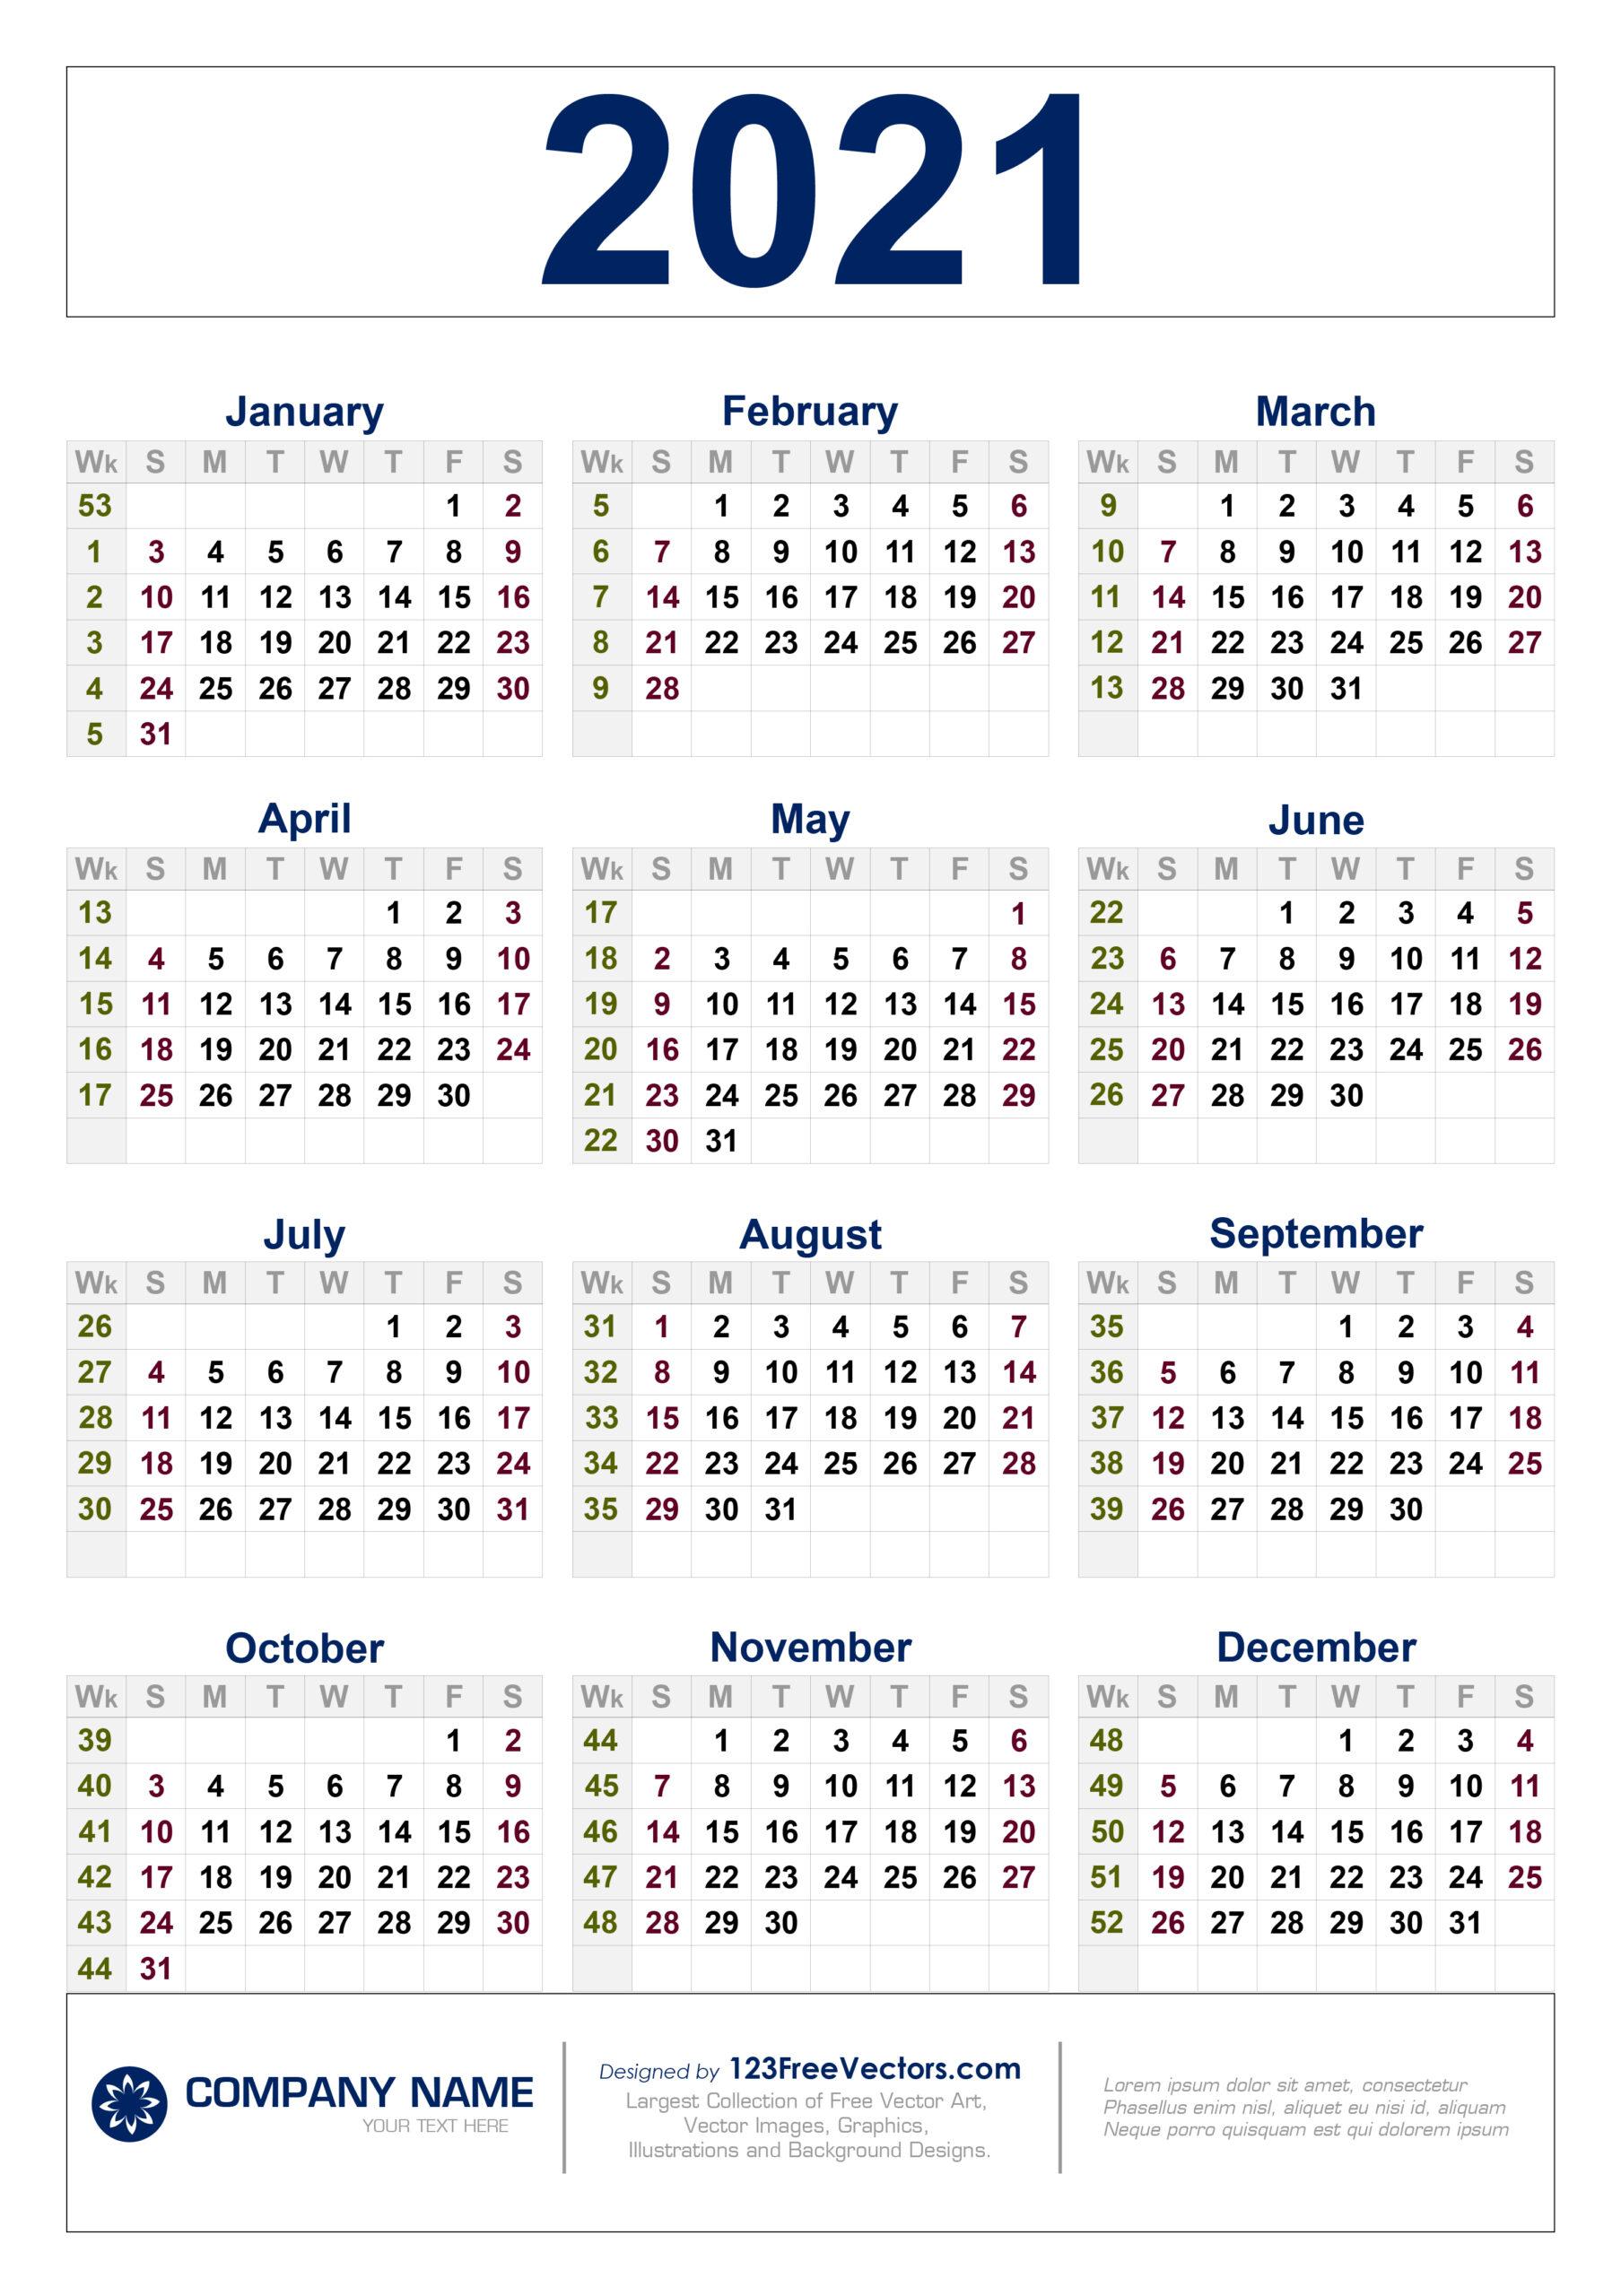 Free Free Download 2021 Calendar With Week Numbers for Weekly Planner For 2021- 52 Weeks